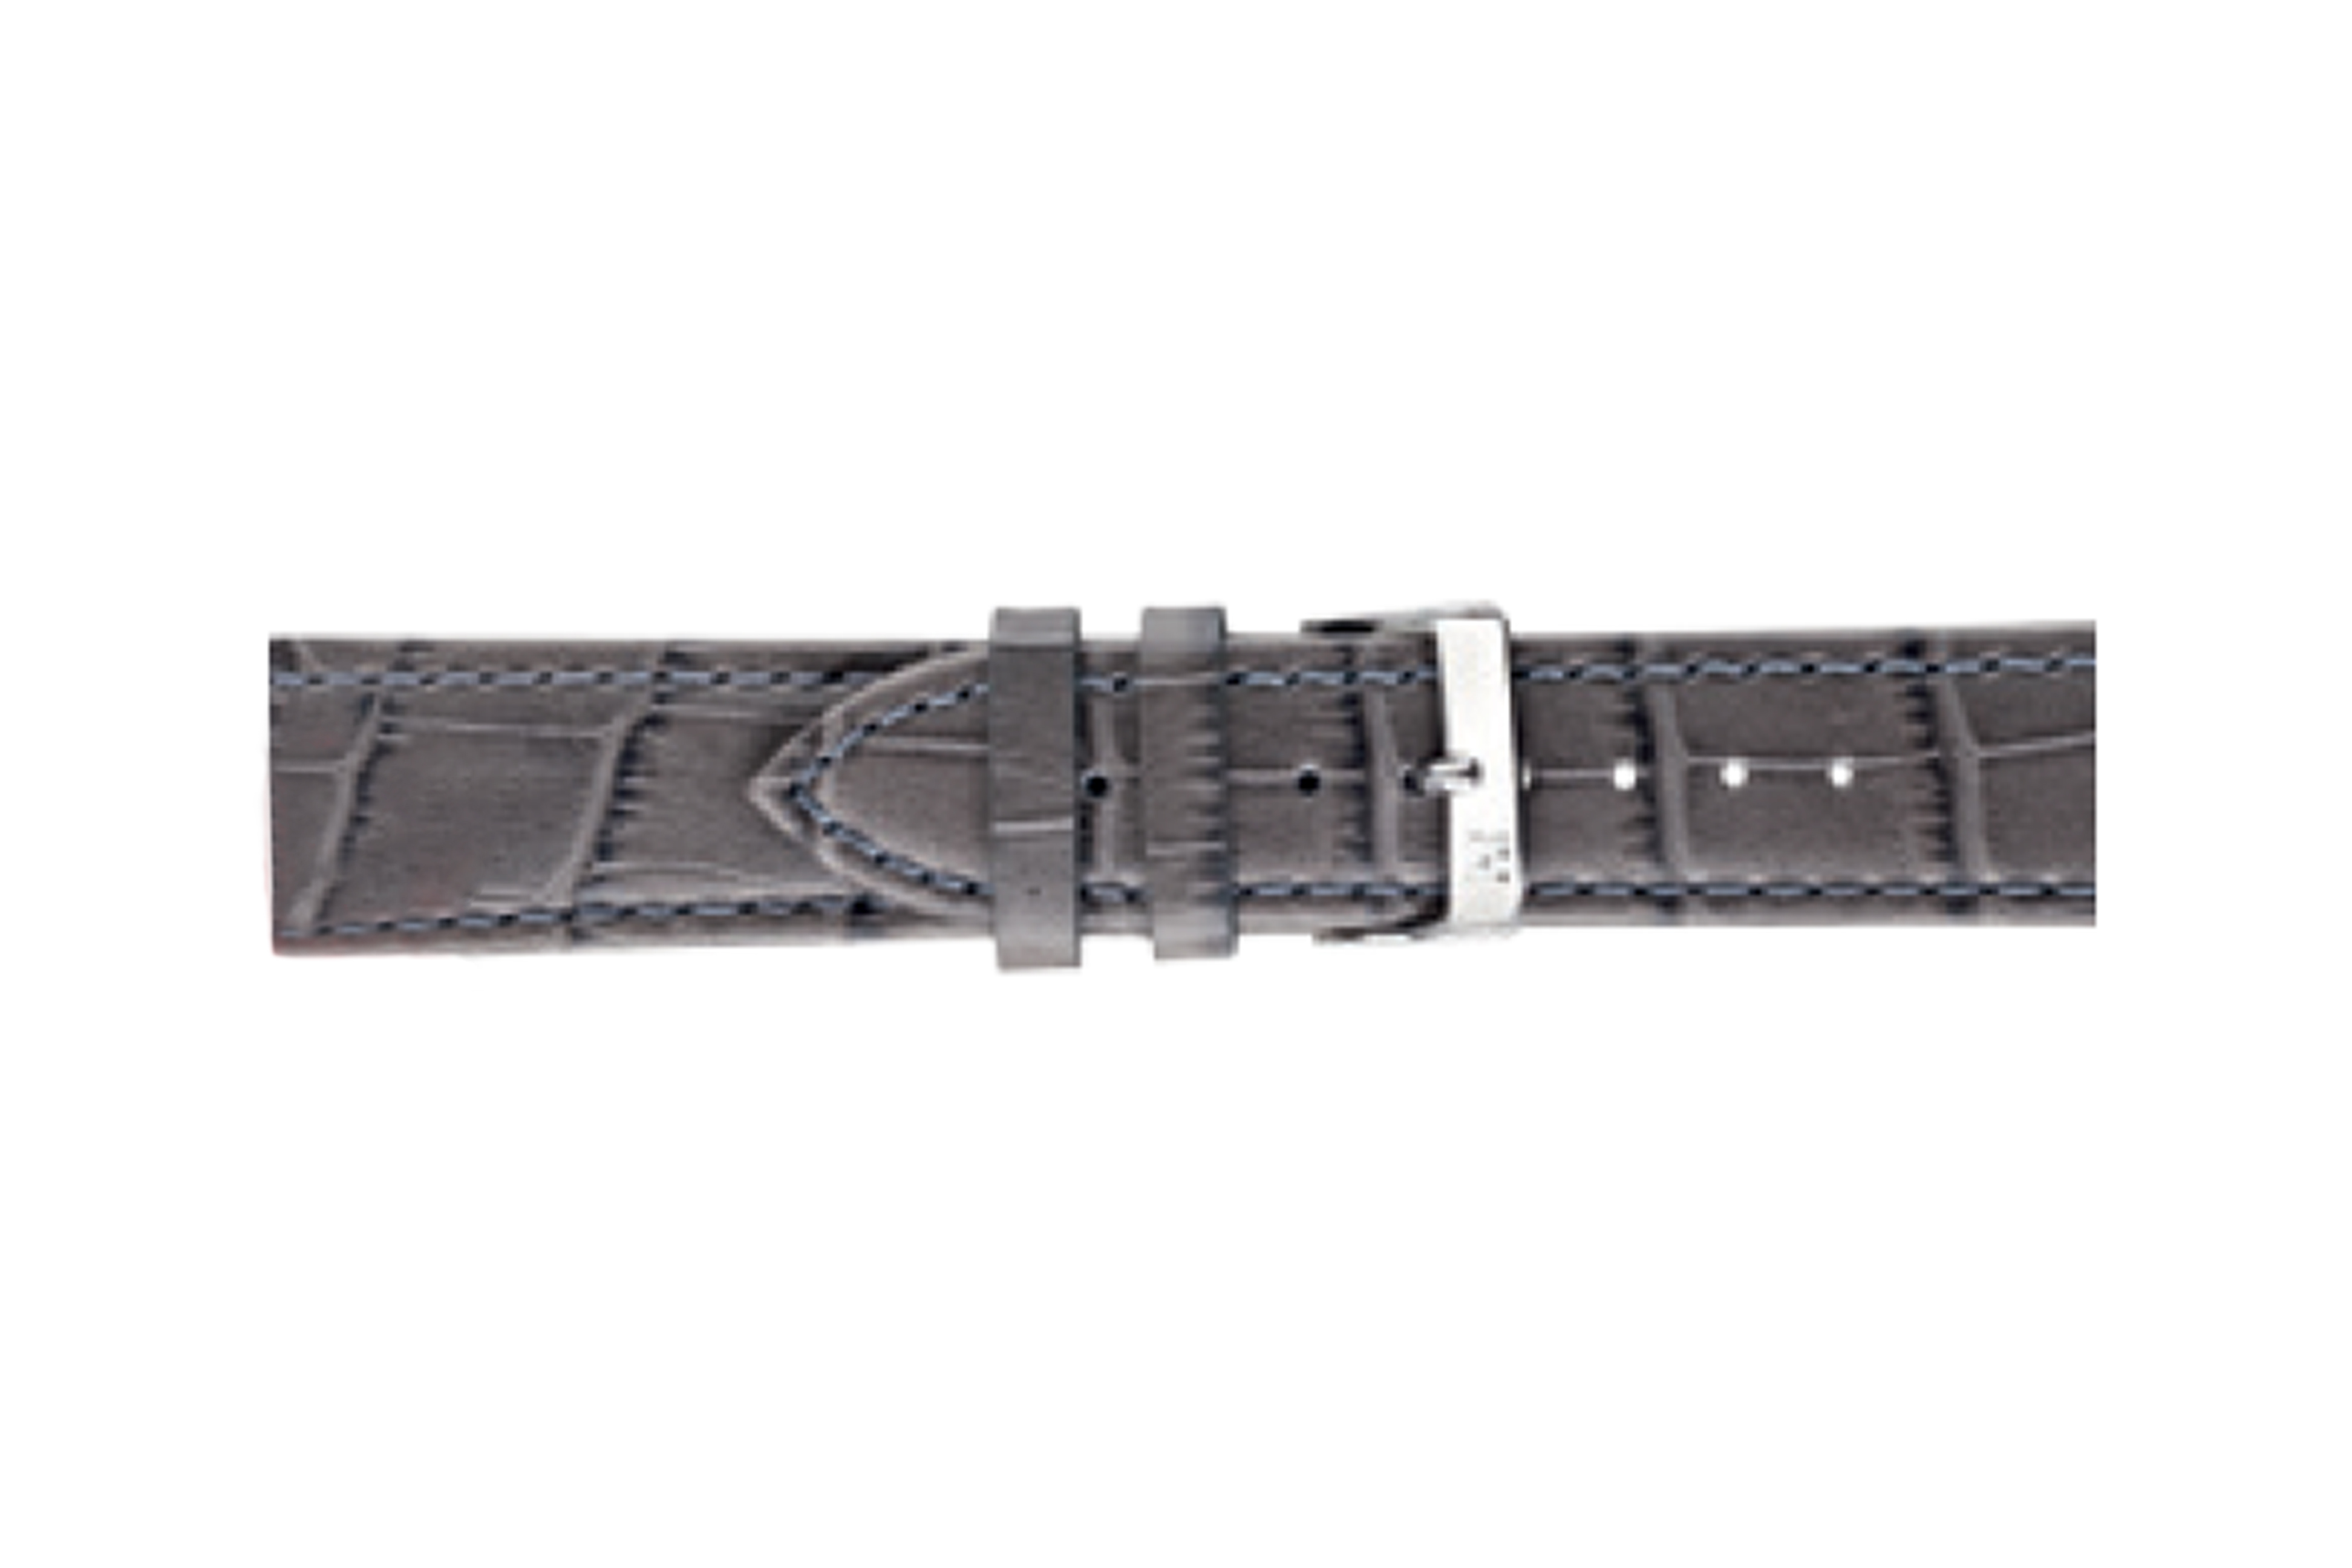 Morellato horlogeband Bolle X2269480090CR24 / PMX090BOLLE24 Croco leder Antracietgrijs 24mm + standaard stiksel